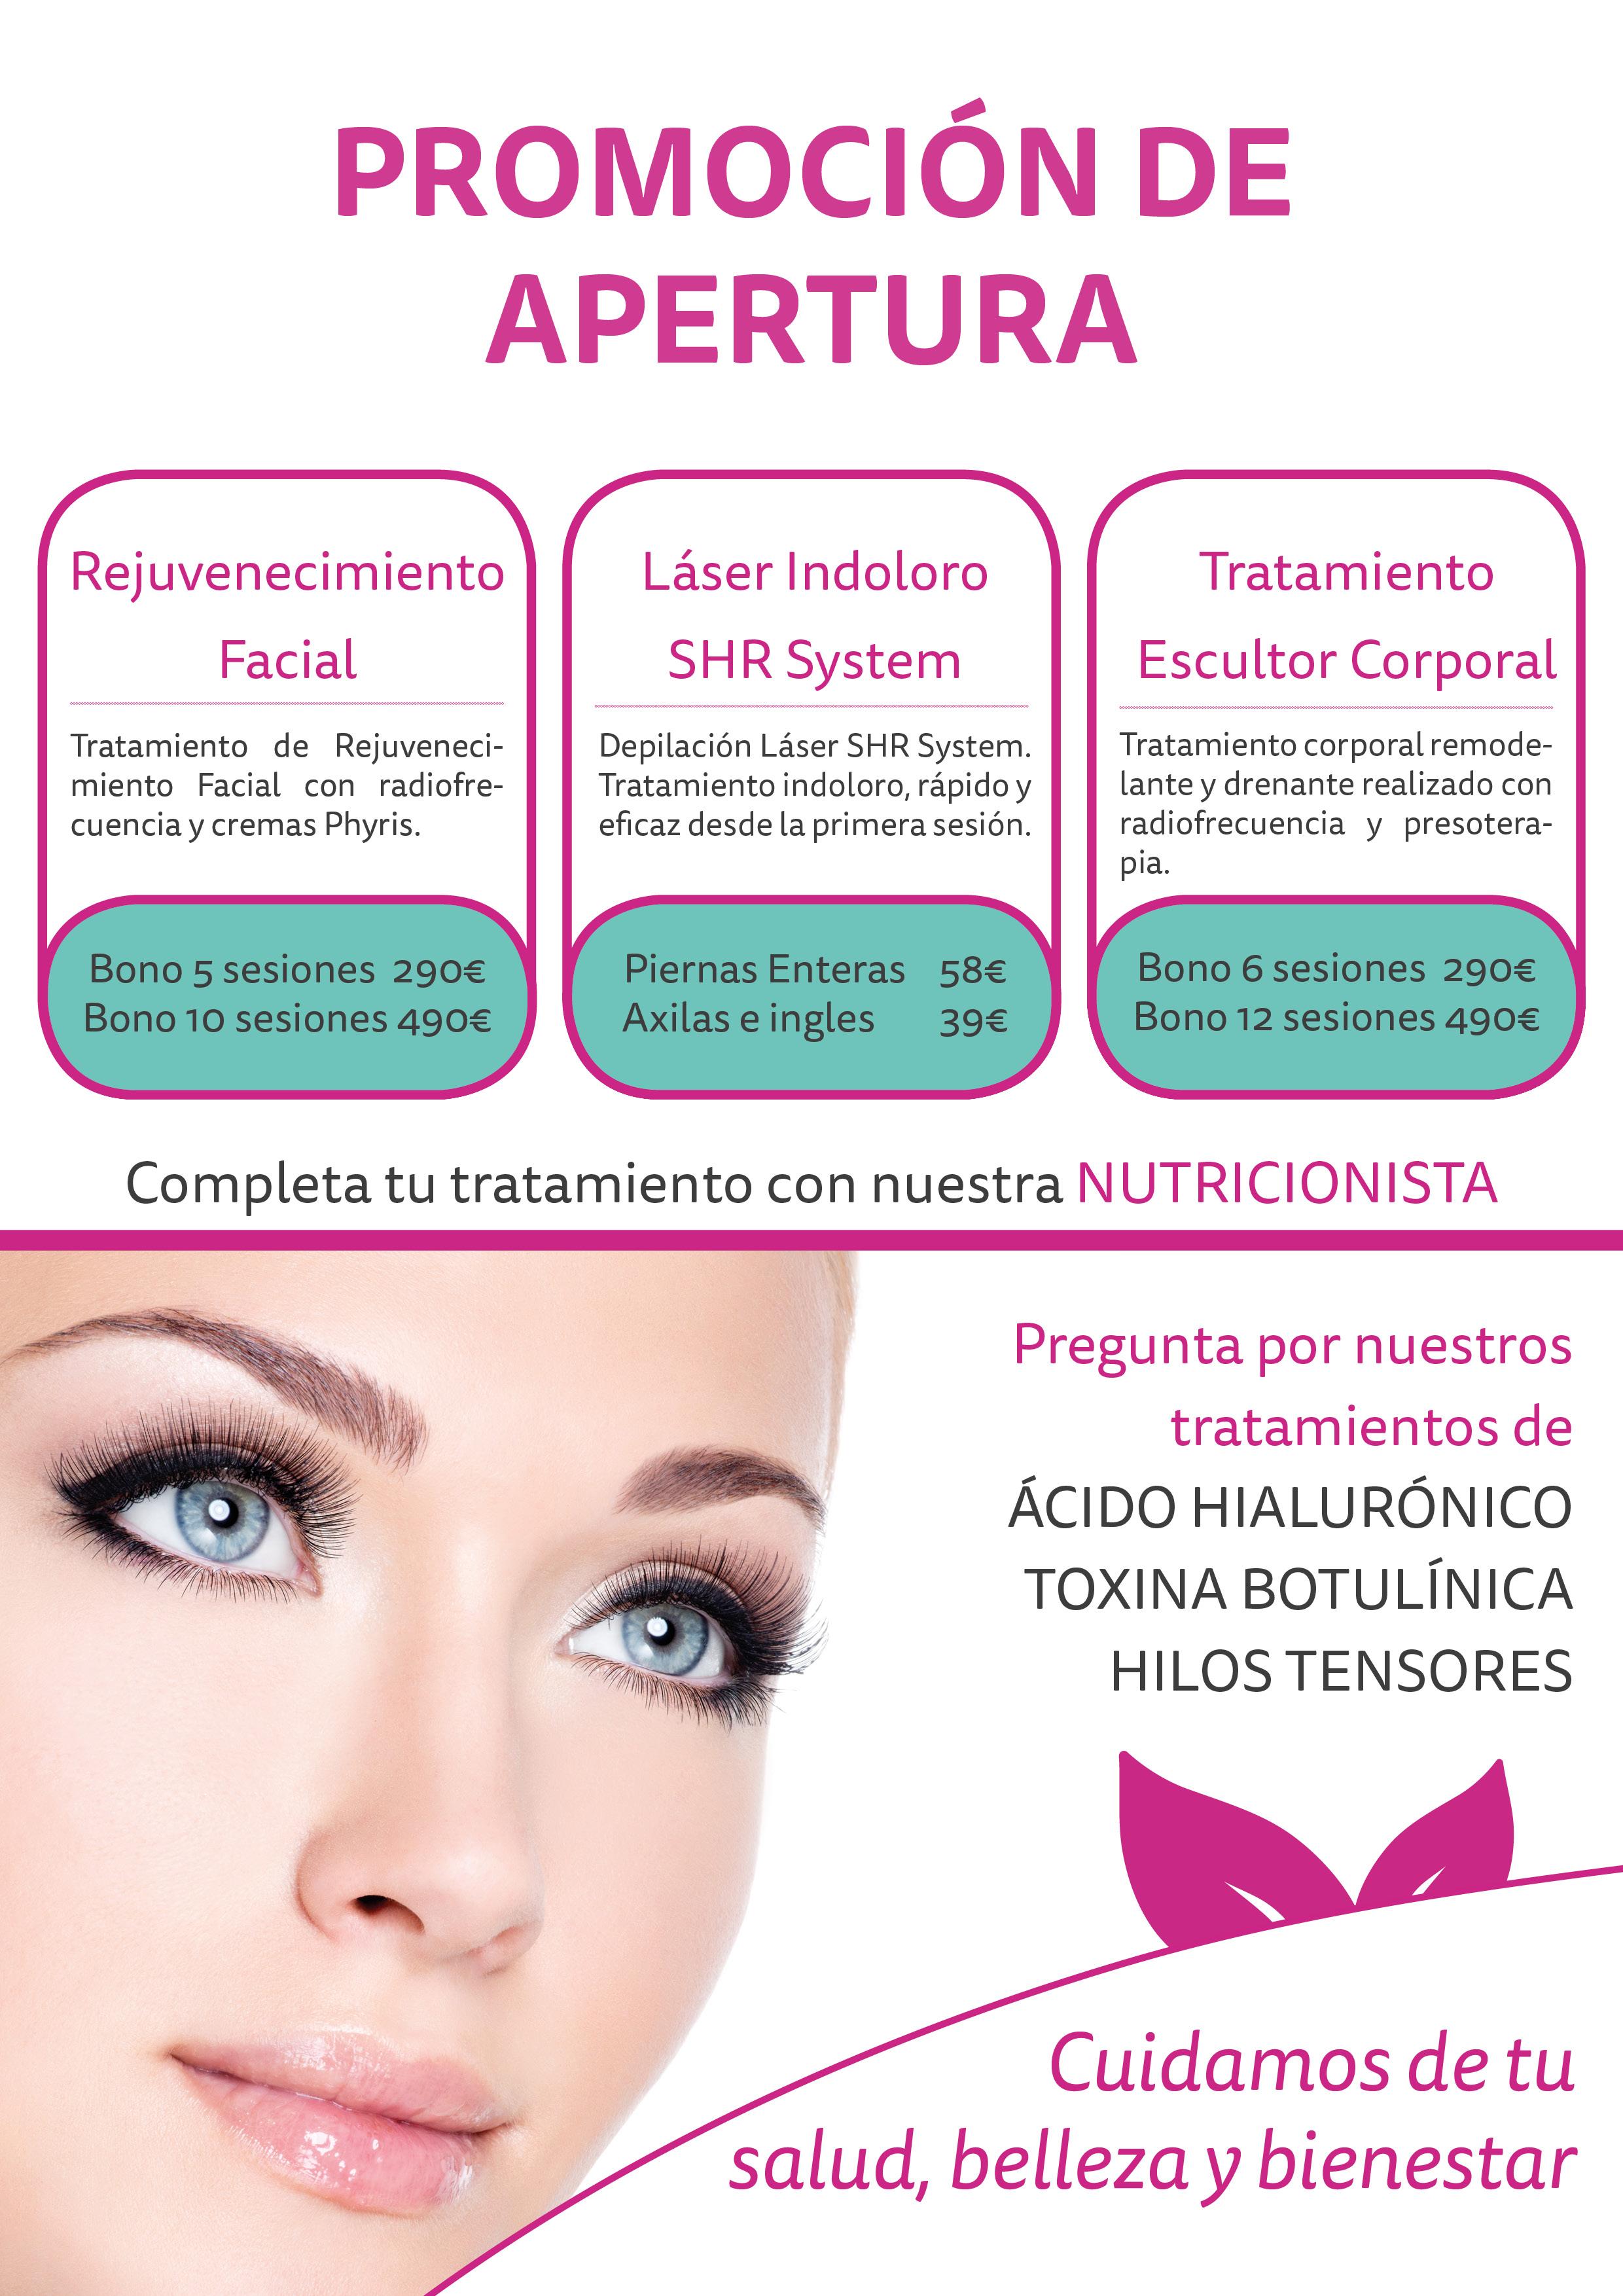 https://clinicabelestar.com/wp-content/uploads/2016/05/publi-fachada-mayo-estetica.jpg